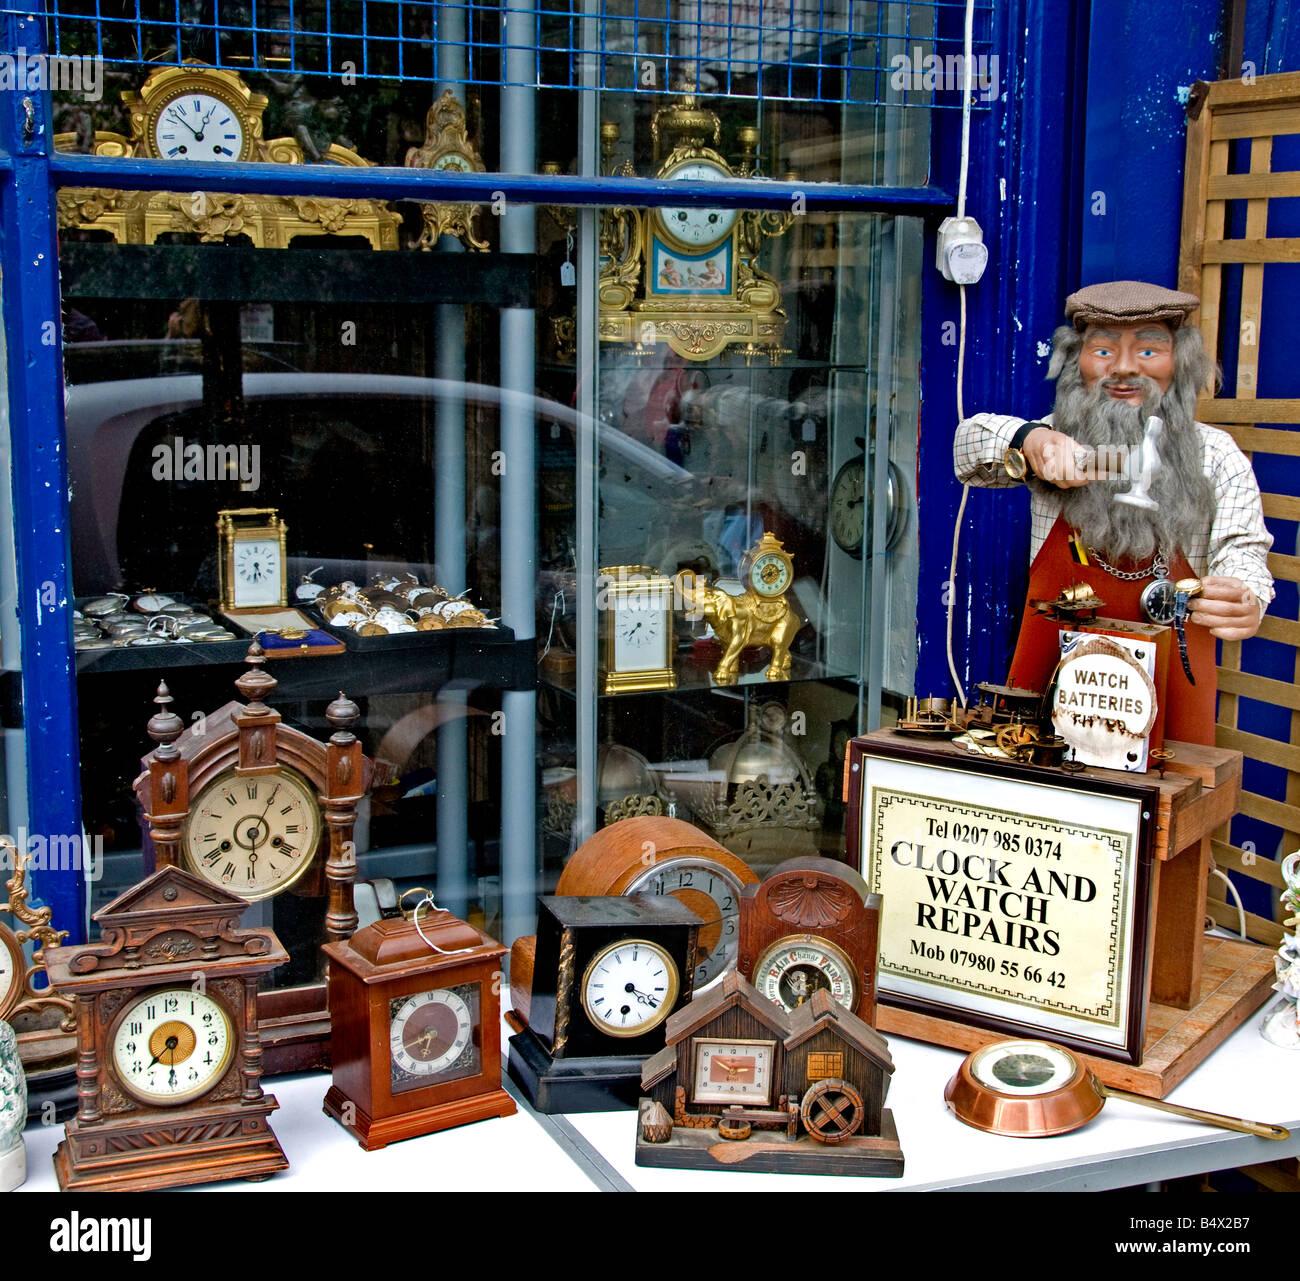 Portobello Road Market Notting Hill London clock - Stock Image